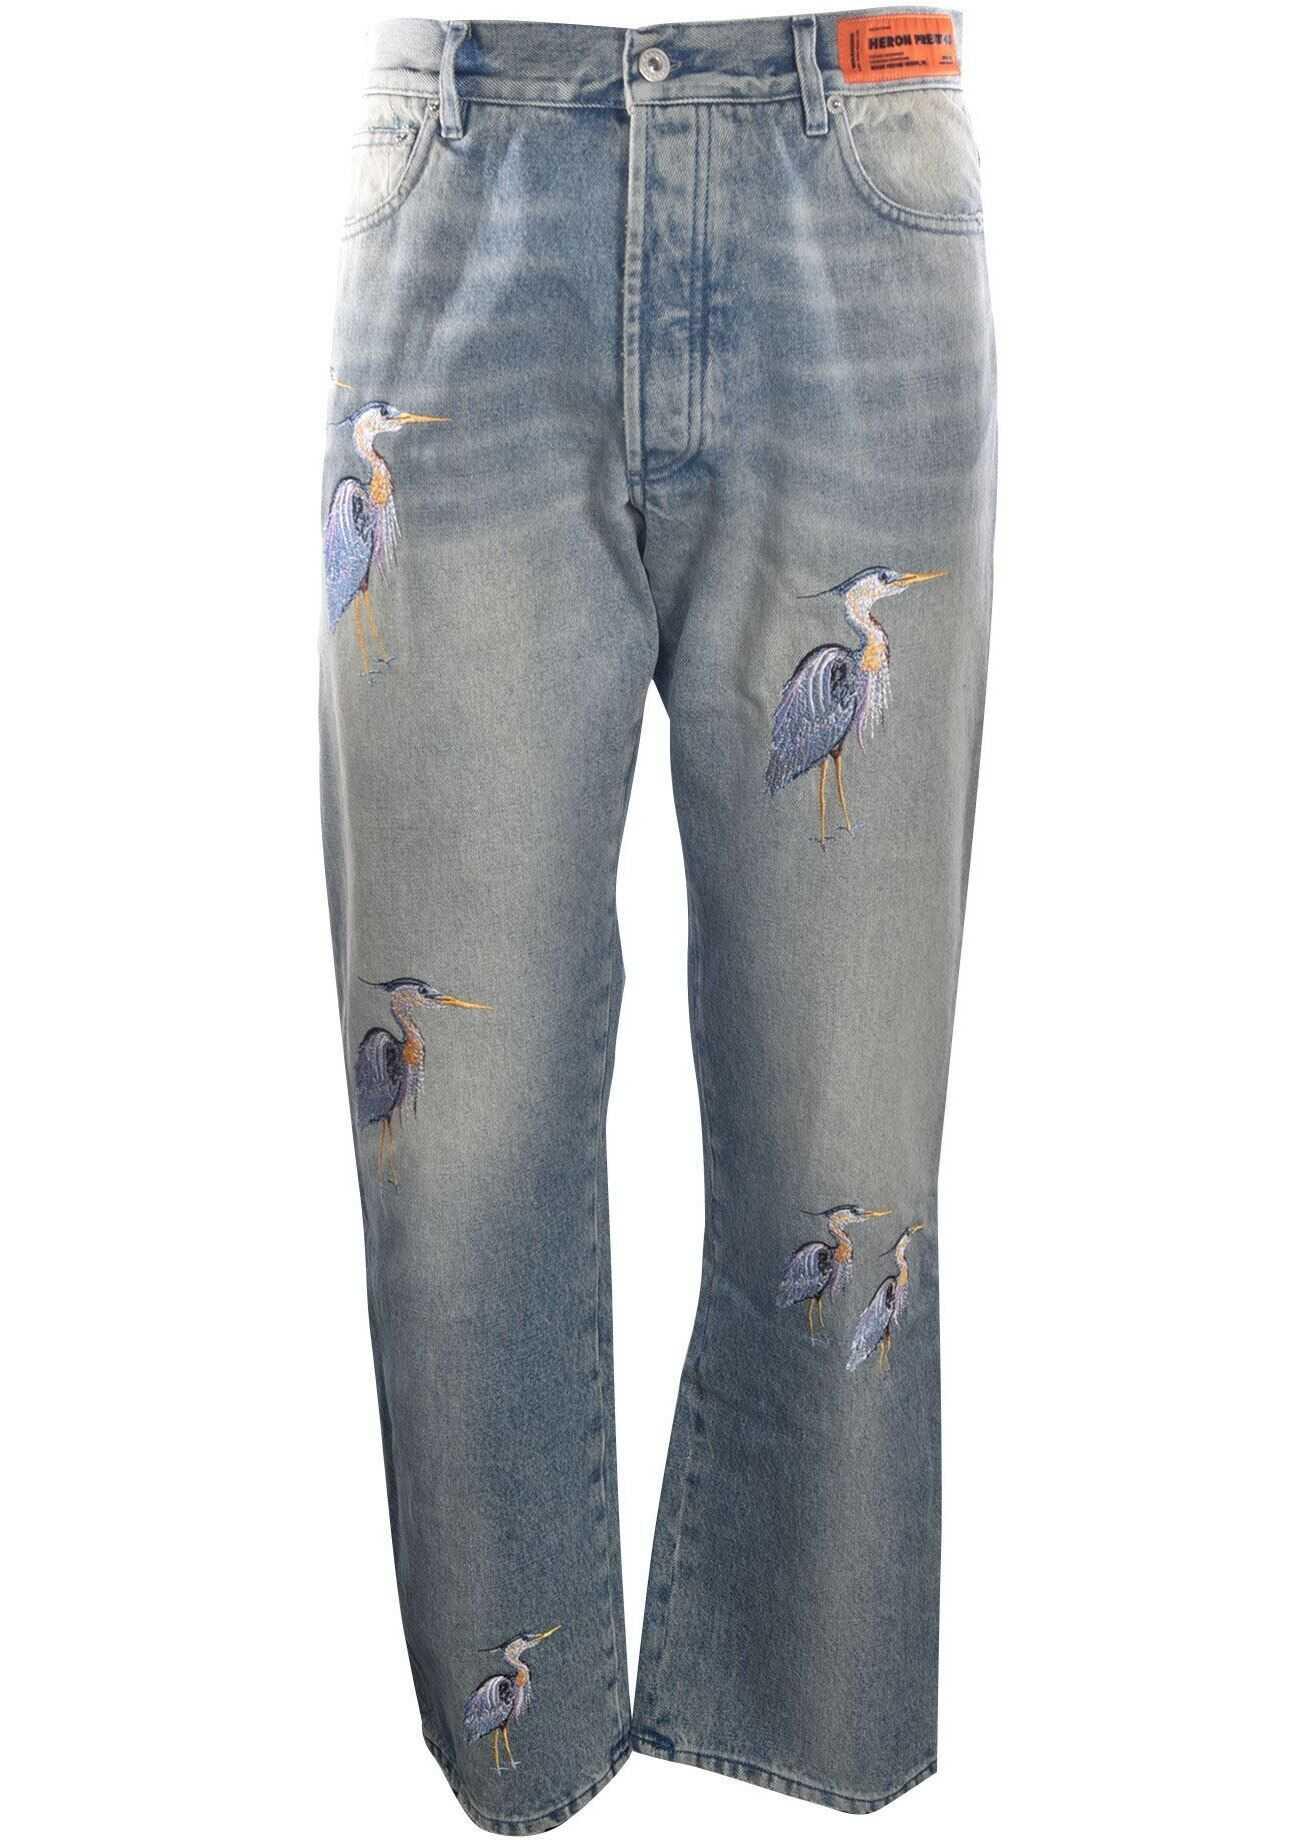 Heron Preston Embroidered Herons Jeans In Light Blue Light Blue imagine